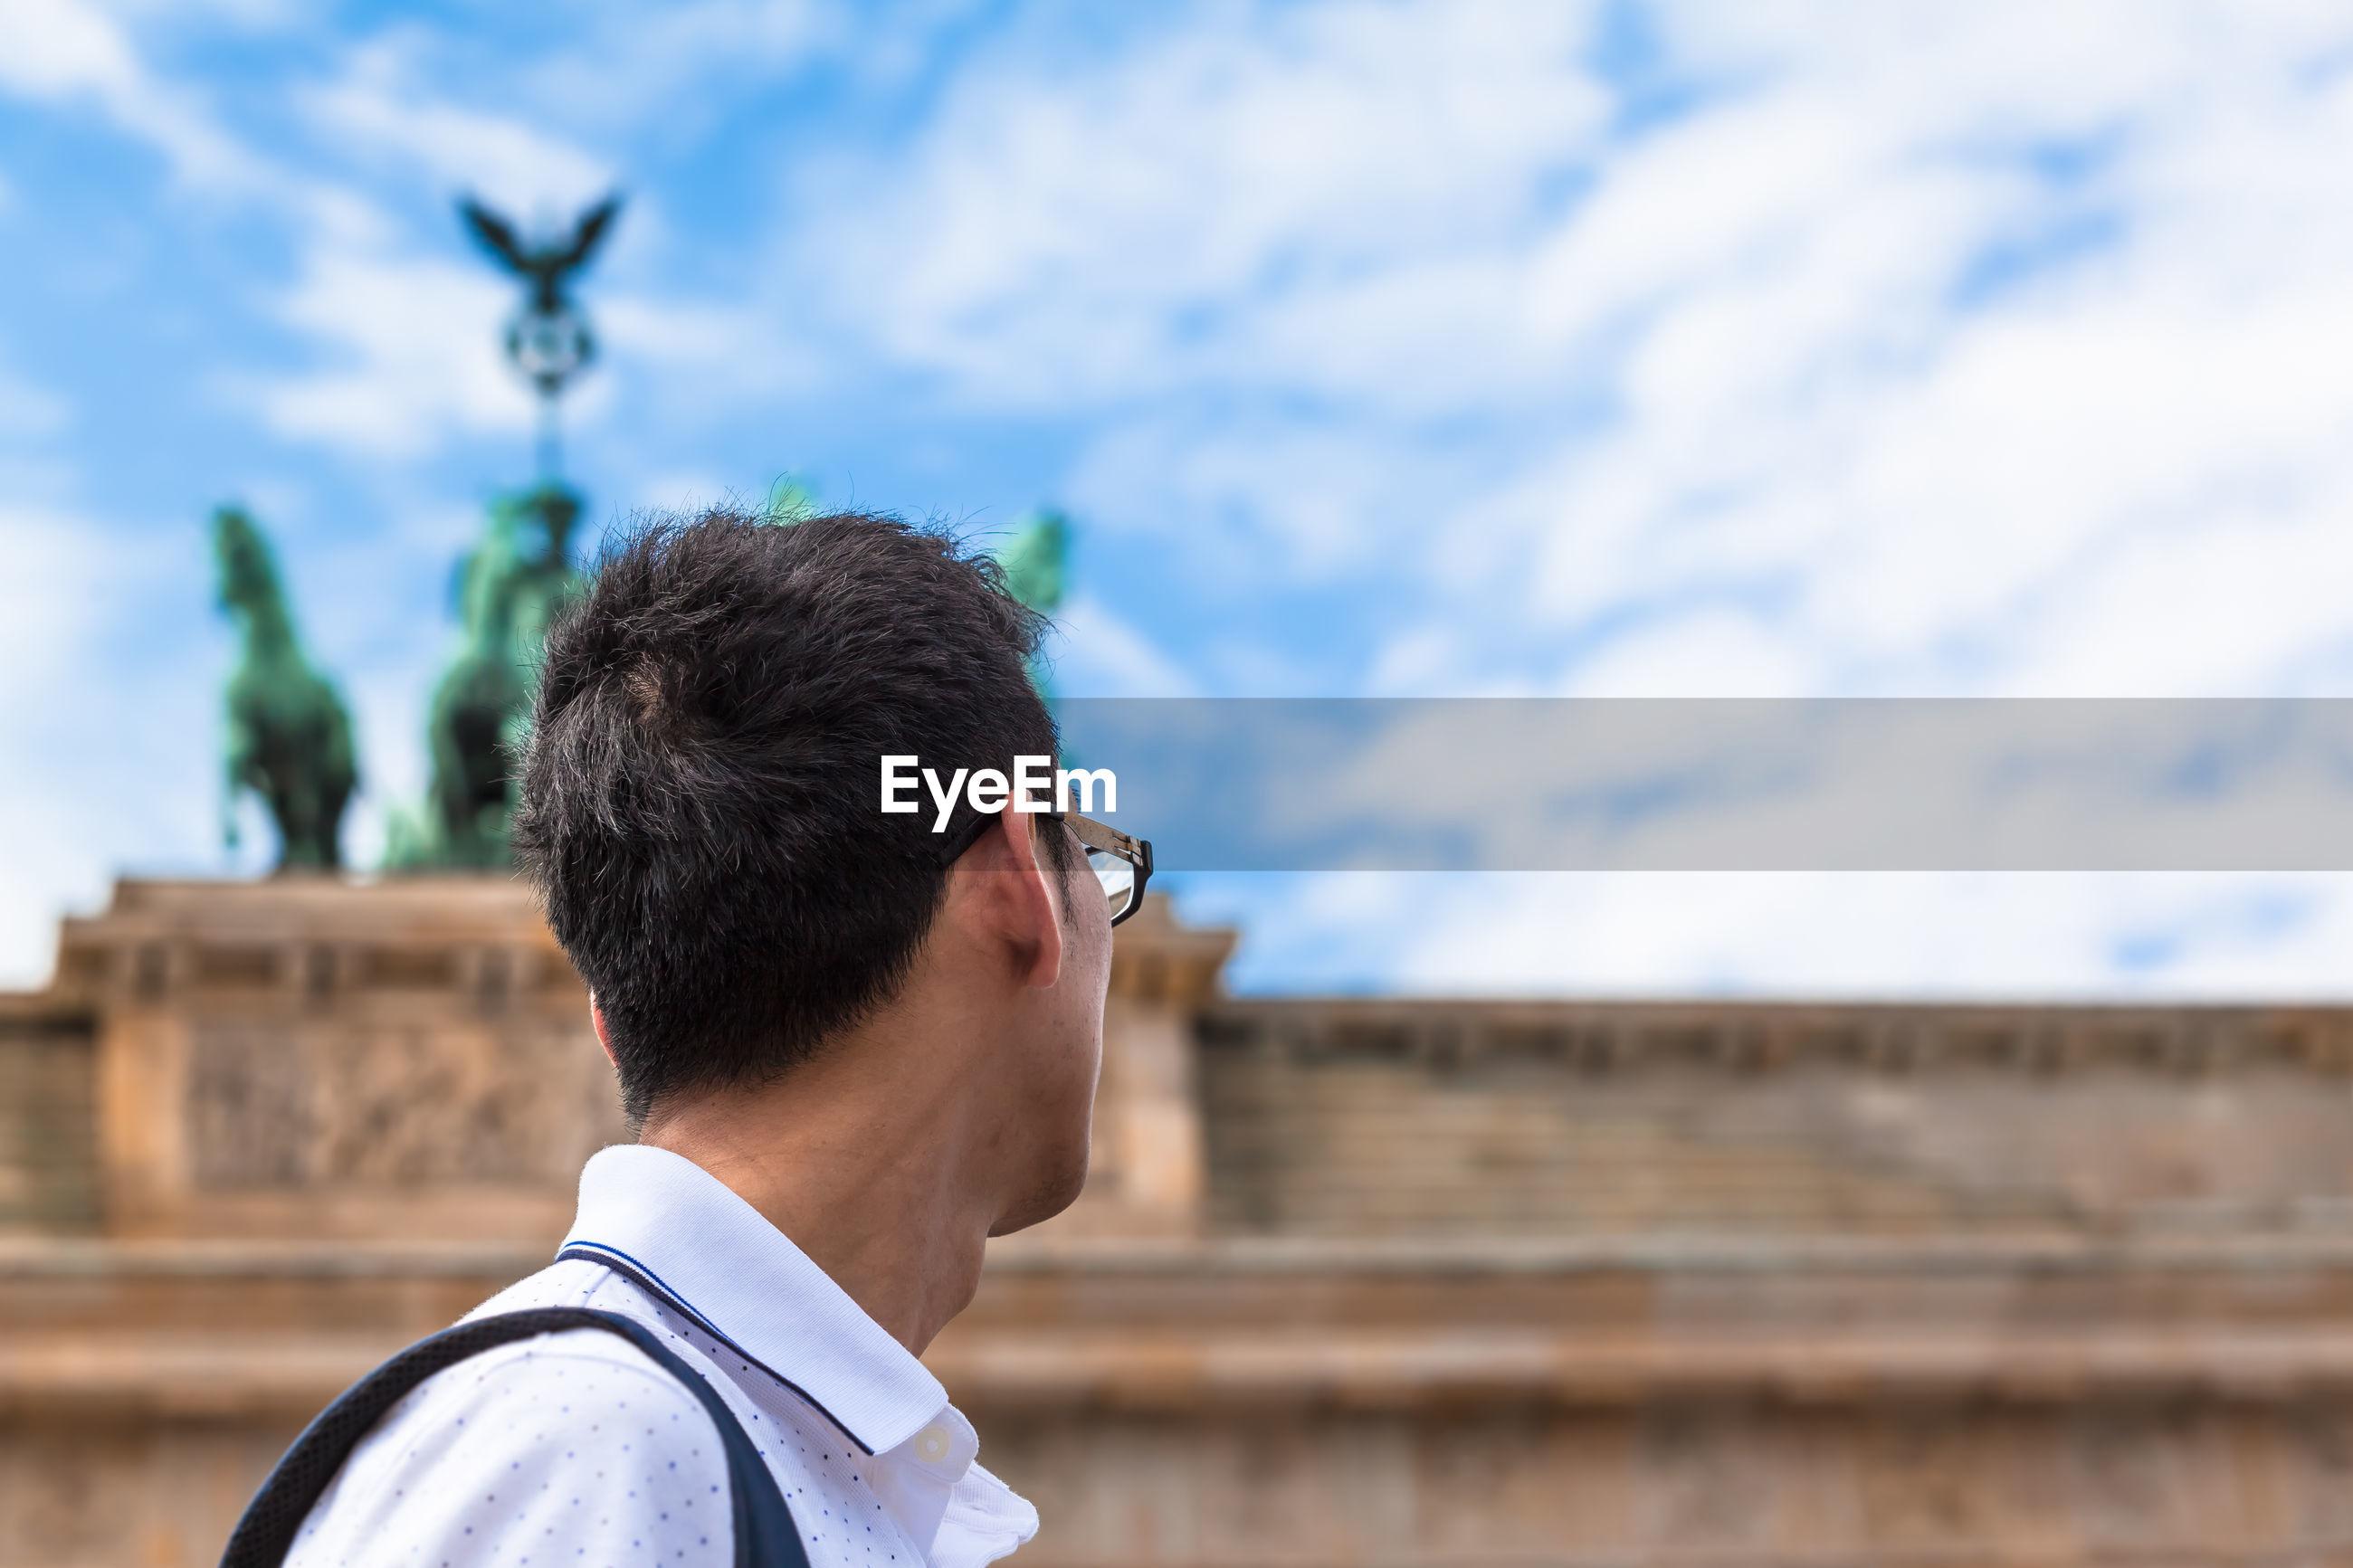 Side view of man looking away against sky in city